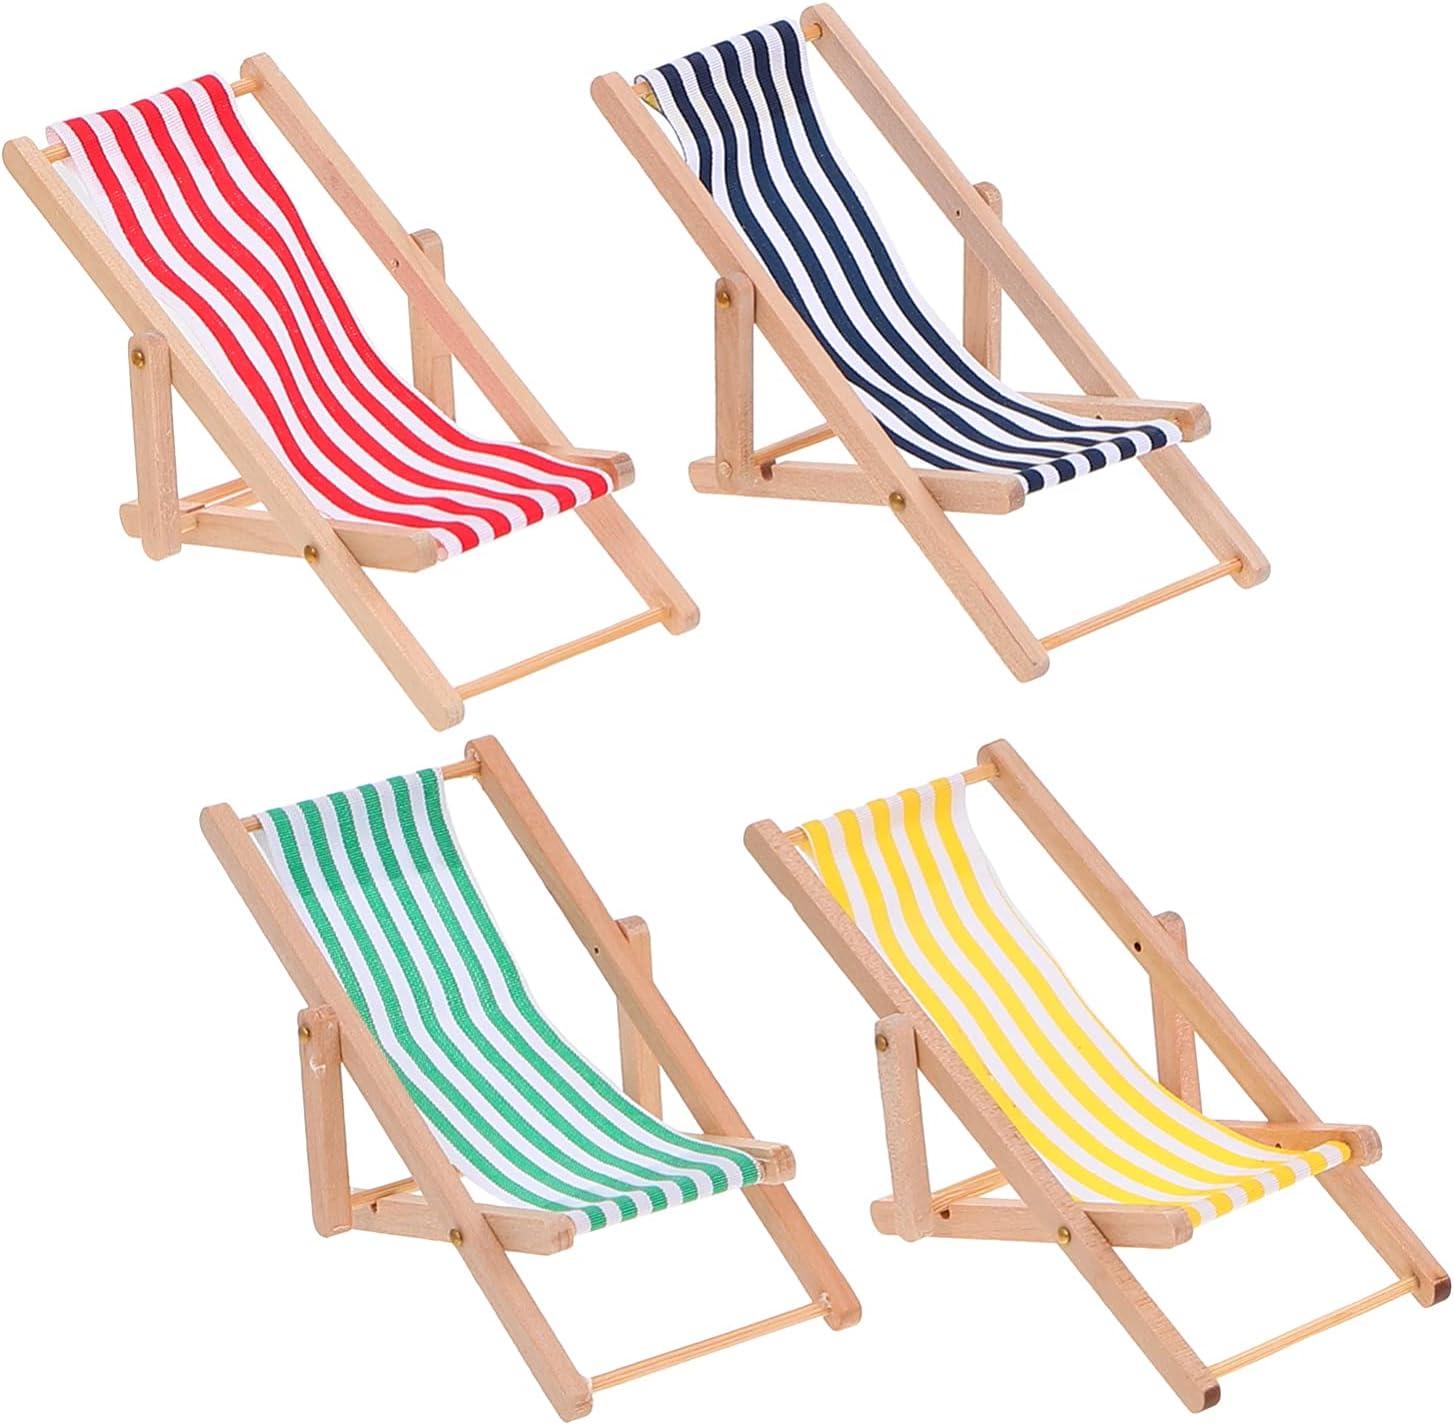 Cabilock 4Pcs Miniature Deluxe Beach Chair Deck Dollhouse 1: 12 Longue Regular discount